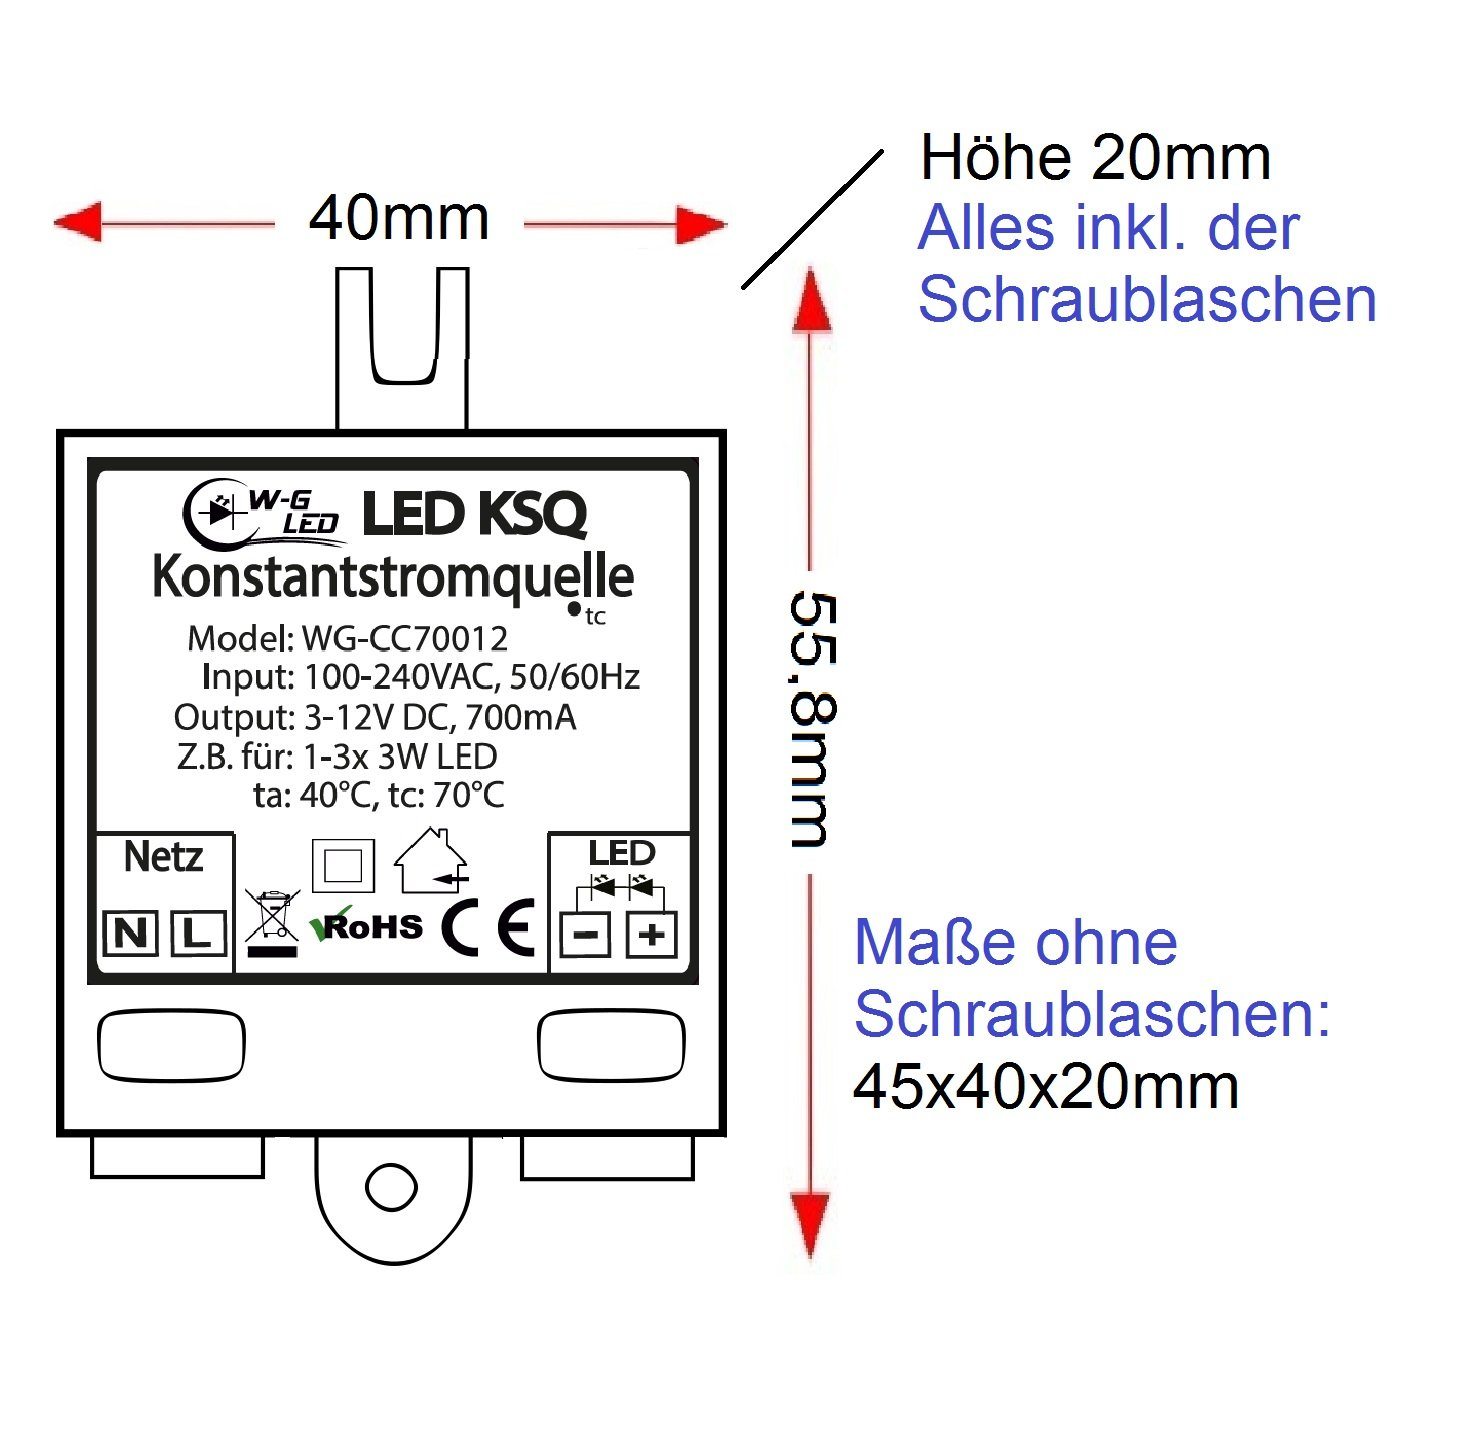 1-3x 3W LED Konstantstromquelle Treiber Constant Current 700mA 3-12V KSQ z.B